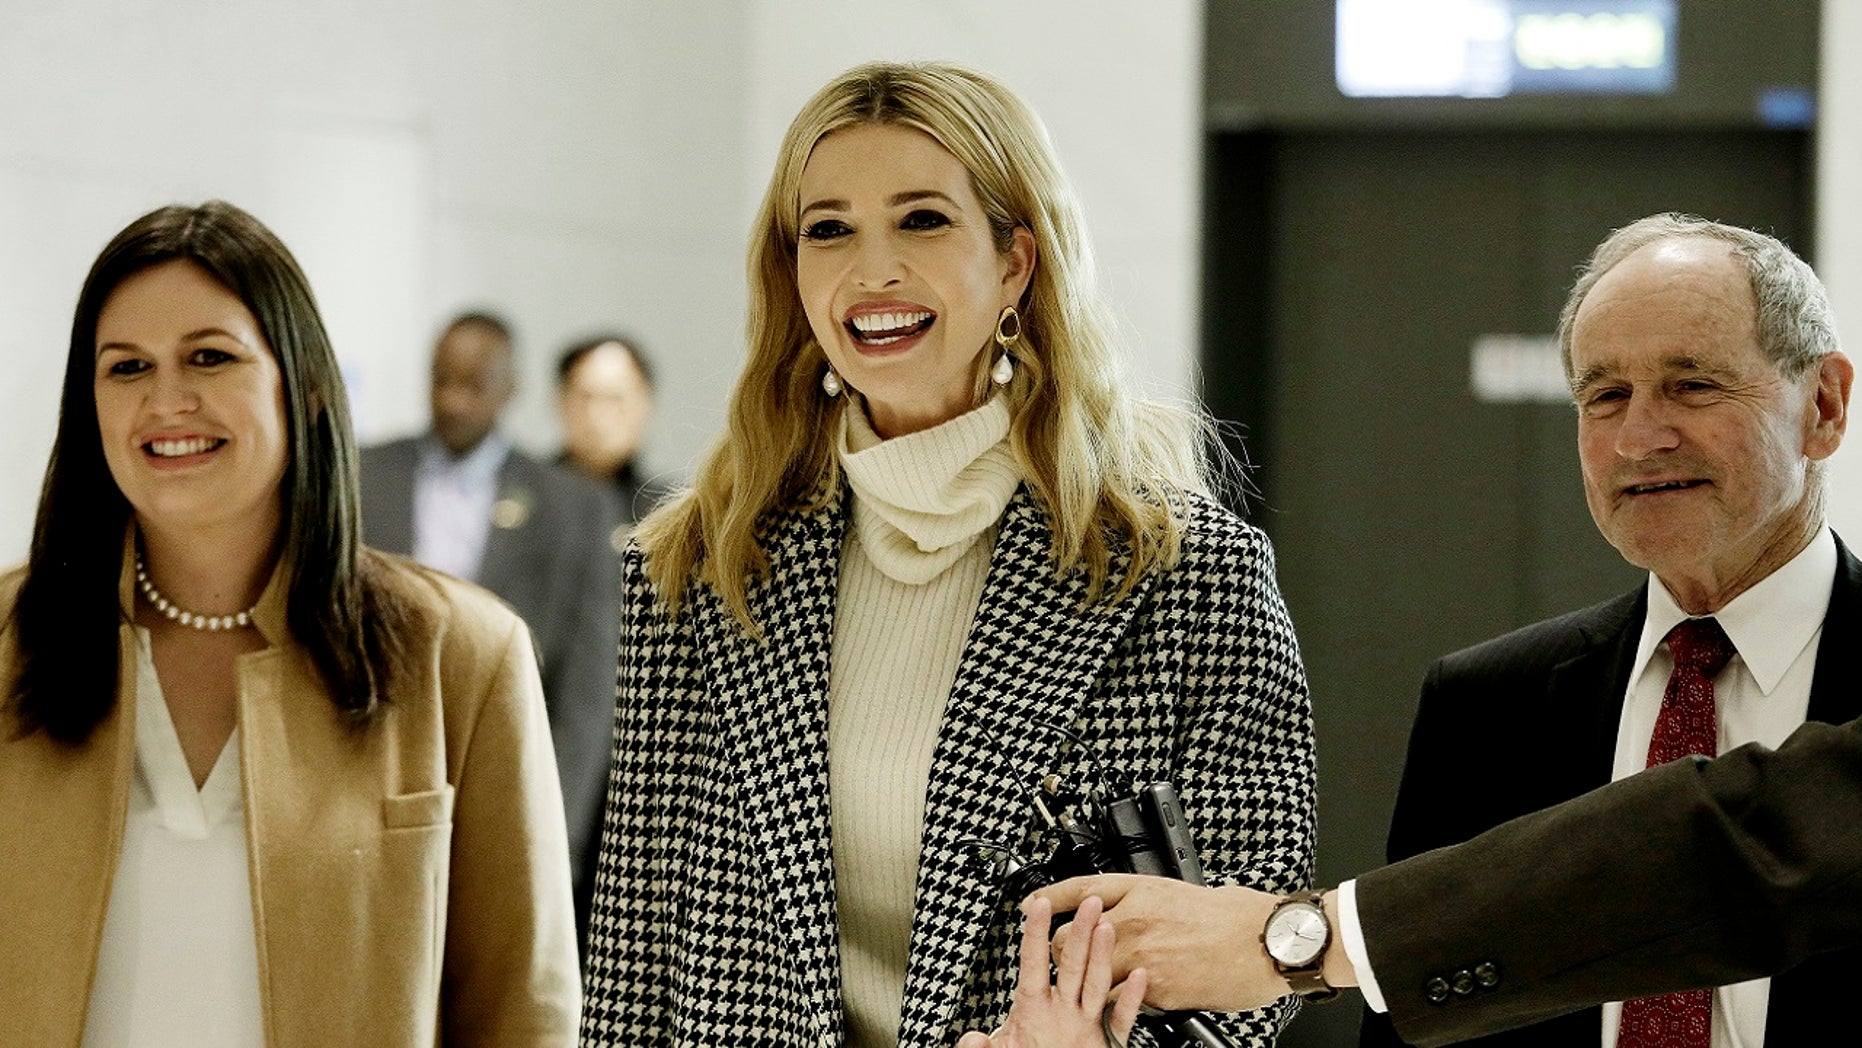 Ivanka Trump, daughter of U.S. President Donald Trump, arrives at the Incheon International Airport in Incheon, South Korea, Feb. 23, 2018. At left is White House press secretary Sarah Sanders.